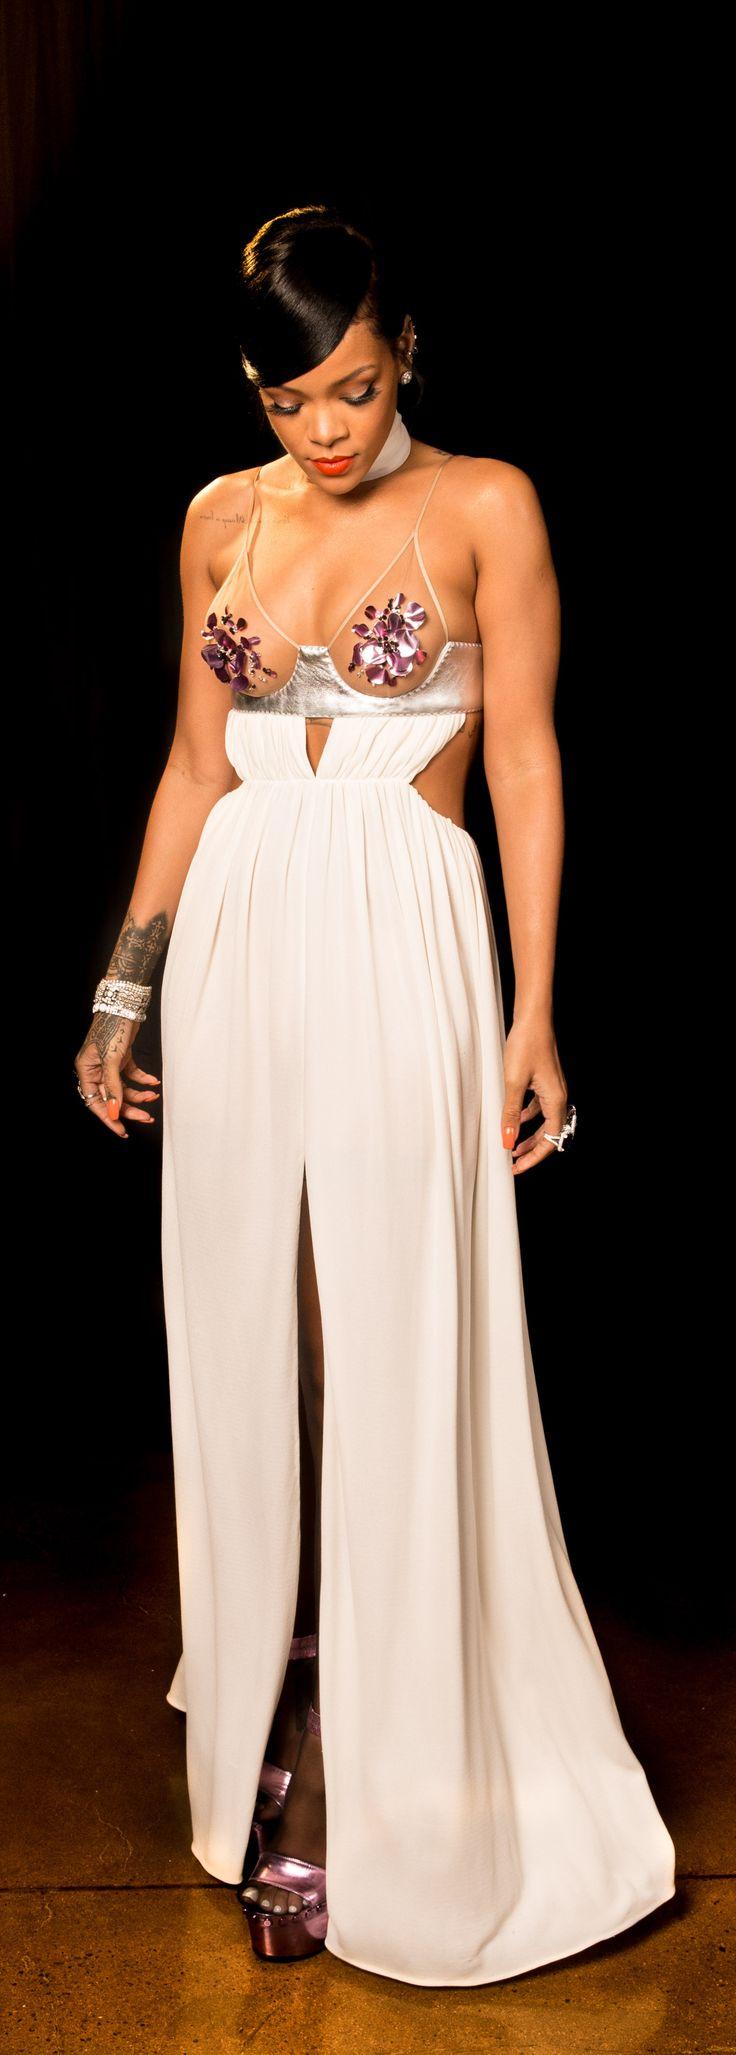 Rihanna's bold Tom Ford look.